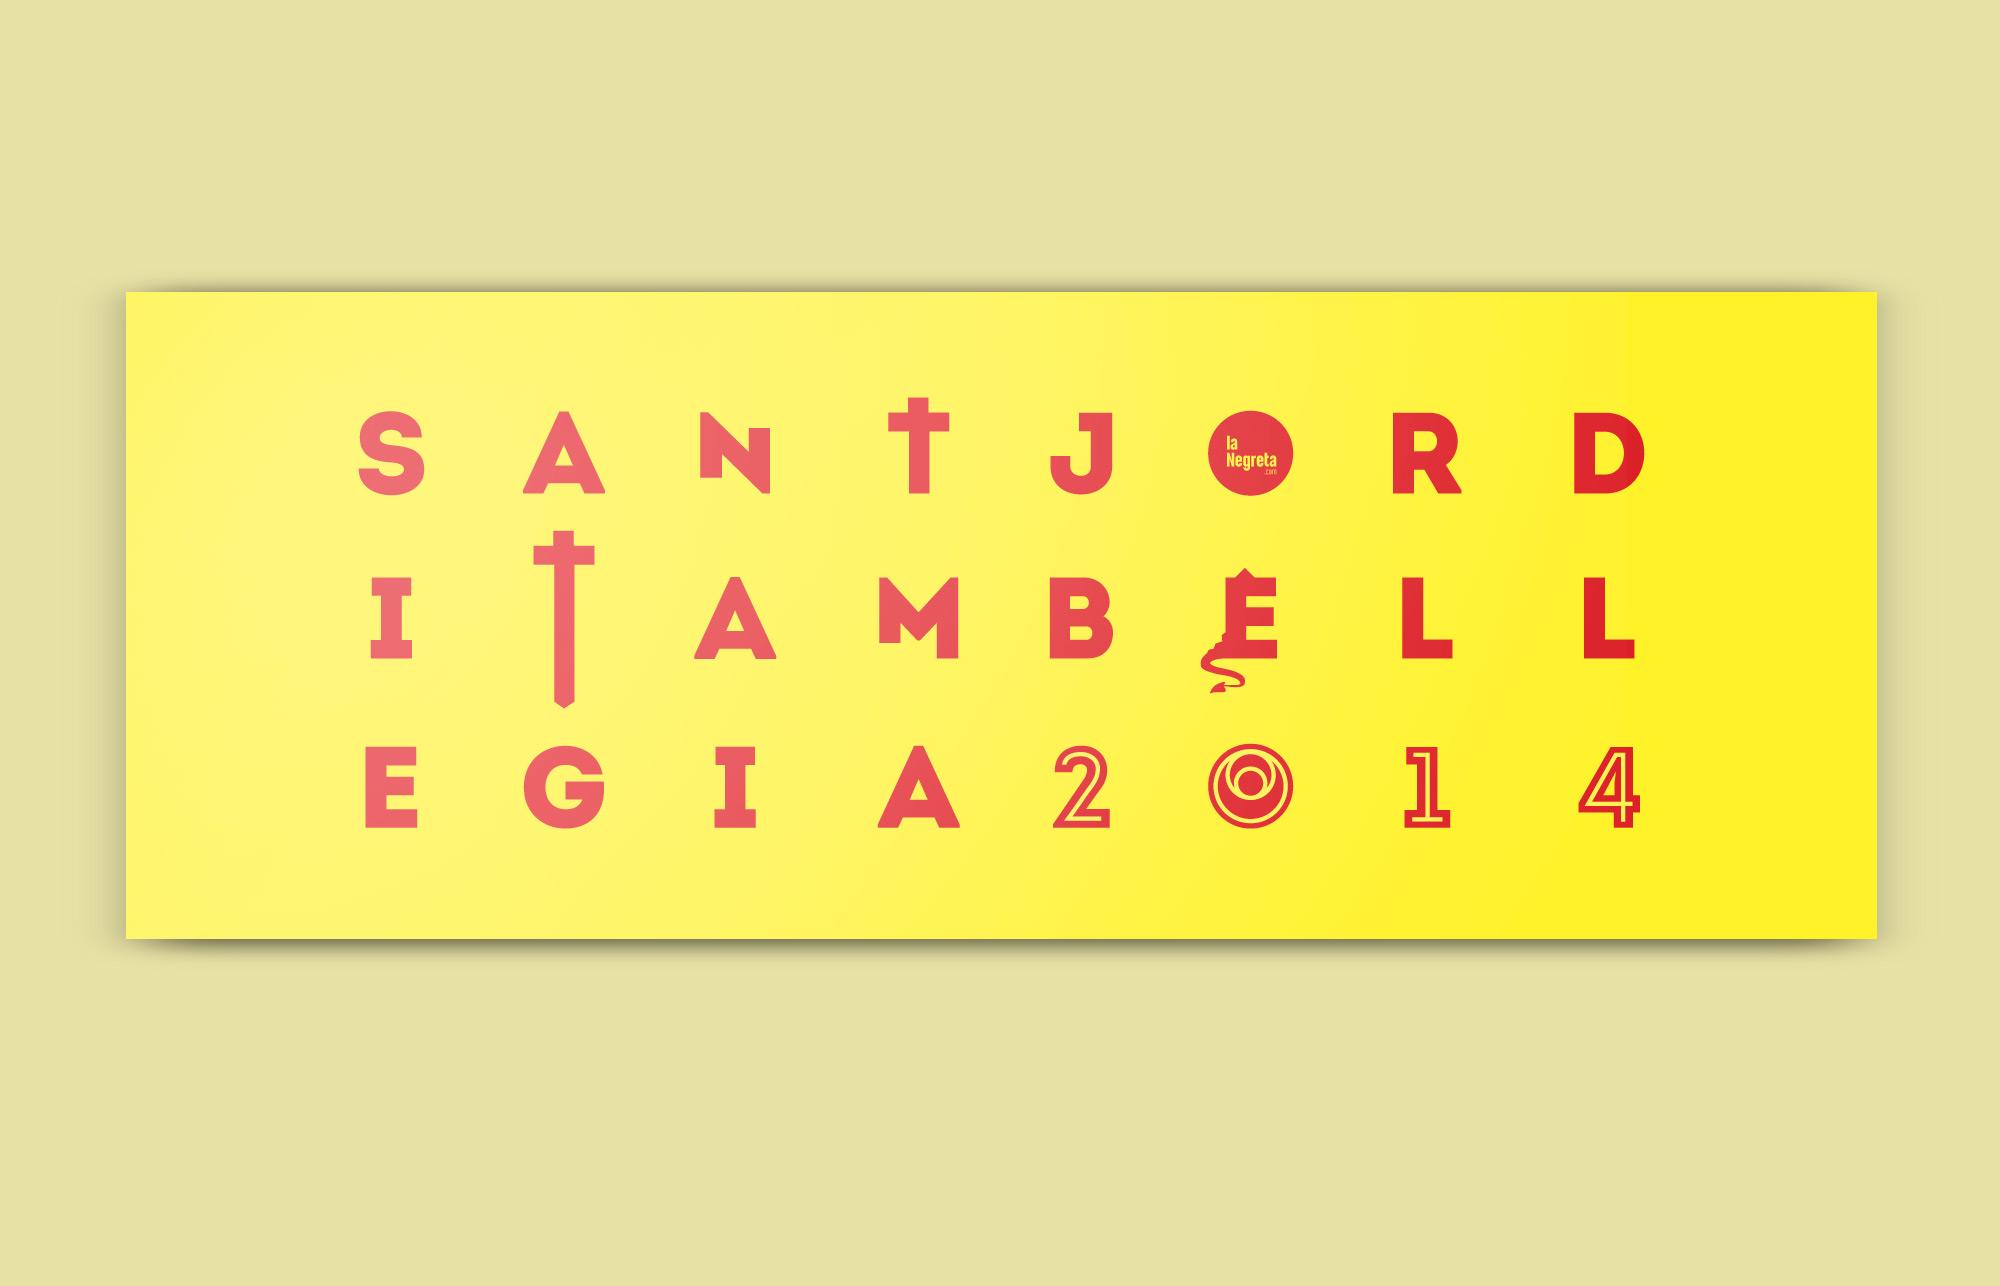 LN-STJORDI2014-B2.jpg